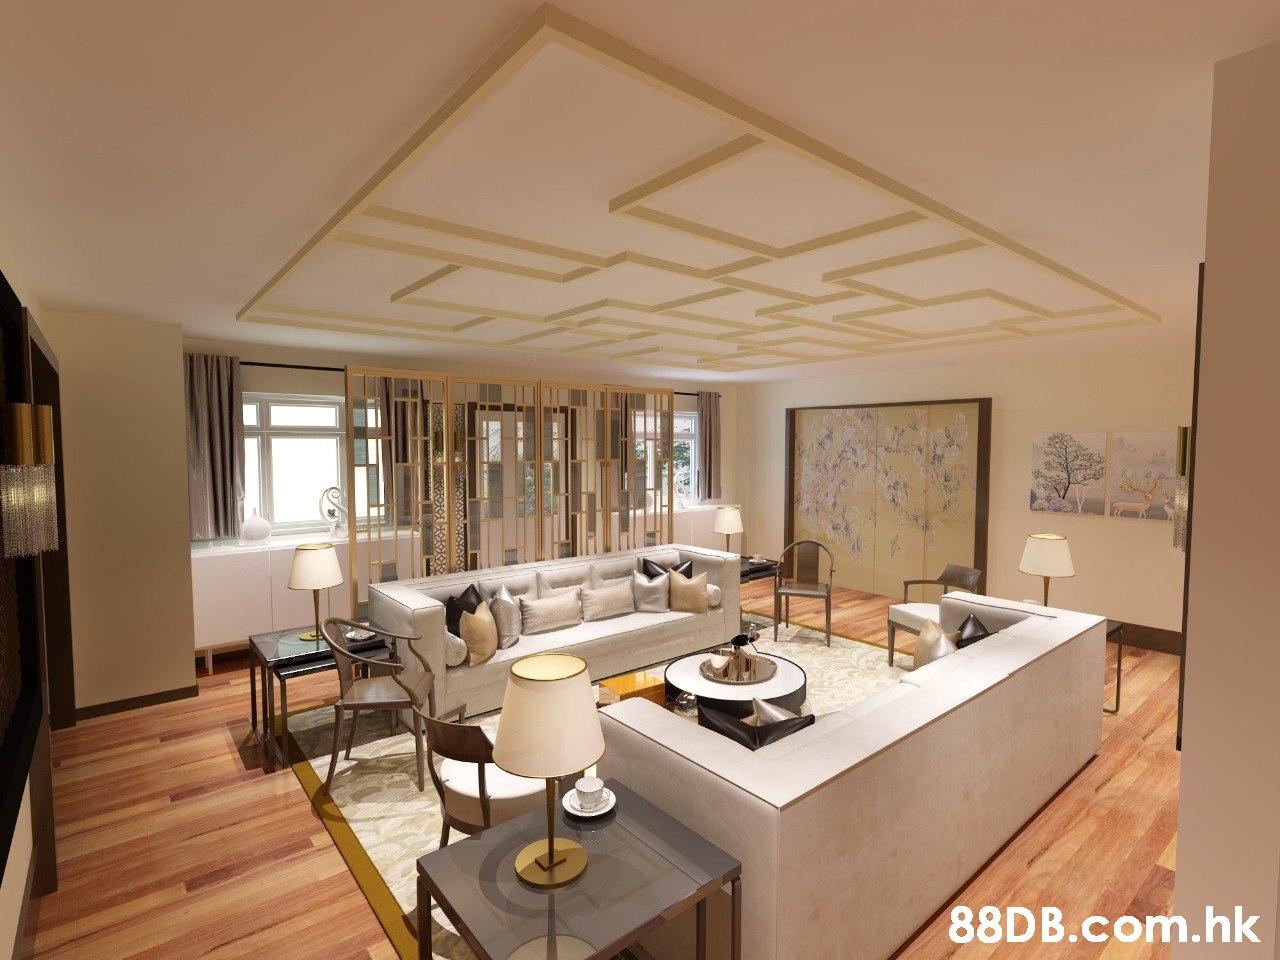 .hk  Property,Room,Interior design,Ceiling,Building